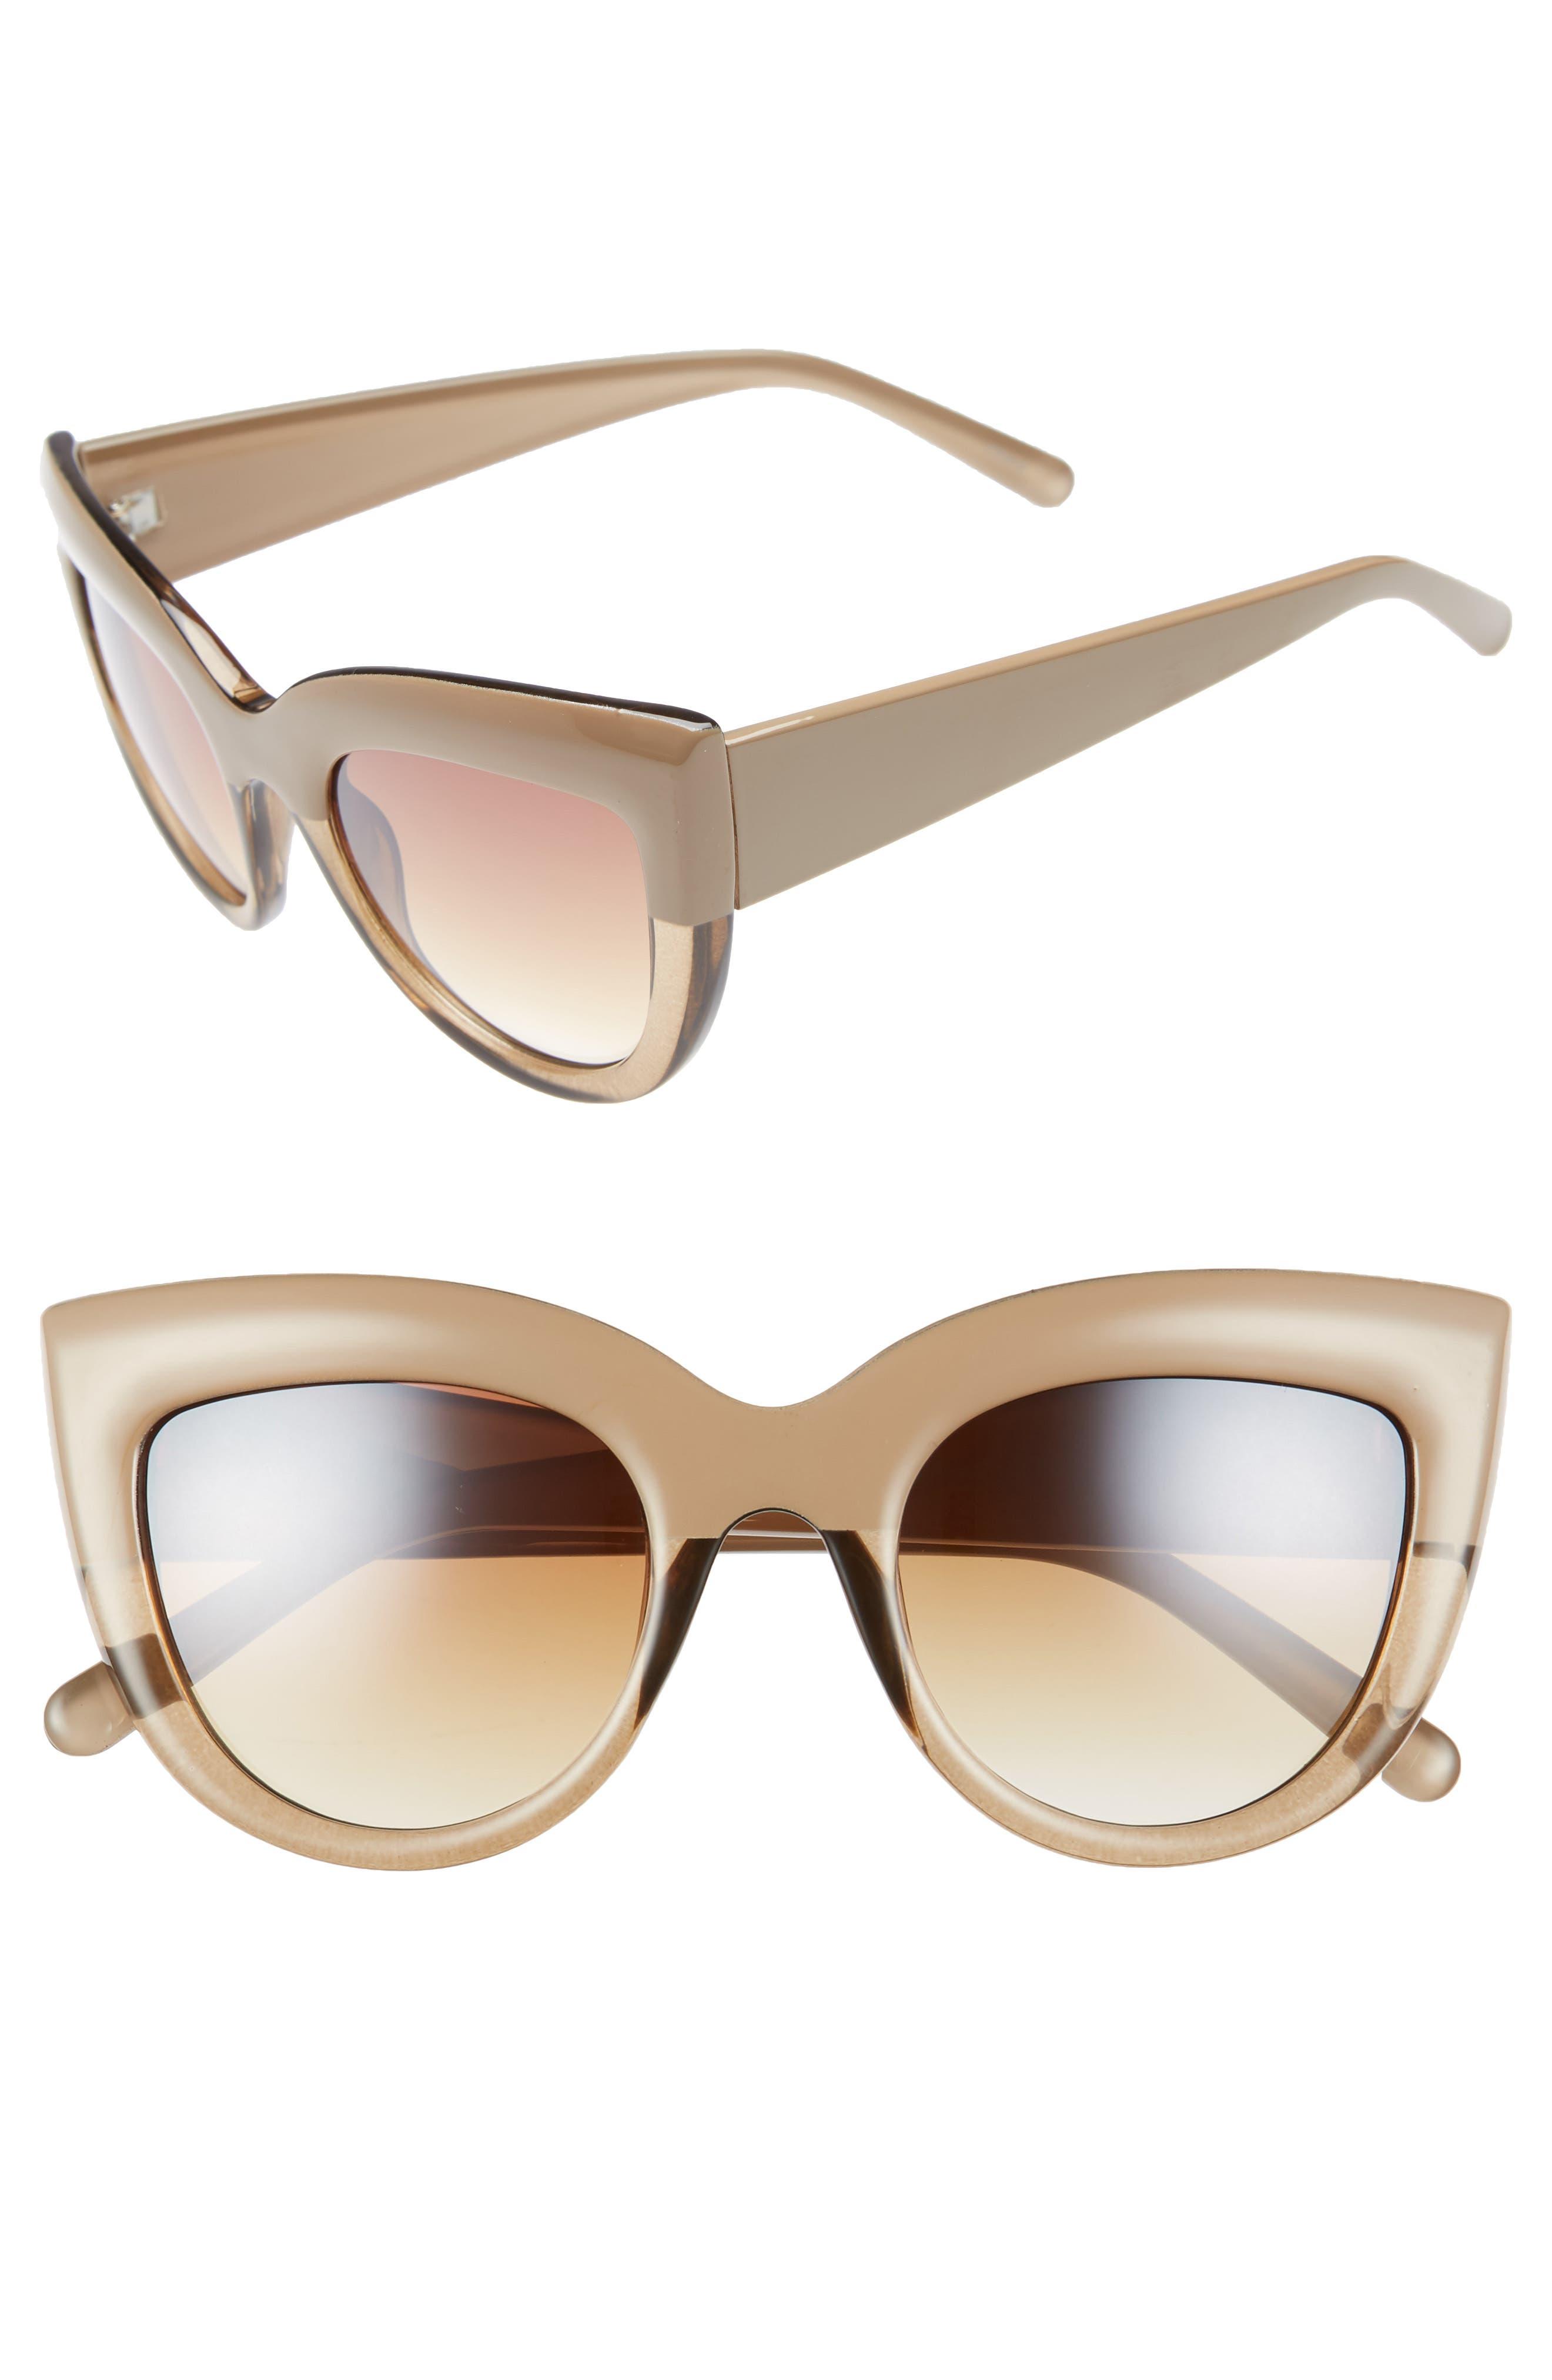 60mm Two-Tone Cat Eye Sunglasses,                             Main thumbnail 1, color,